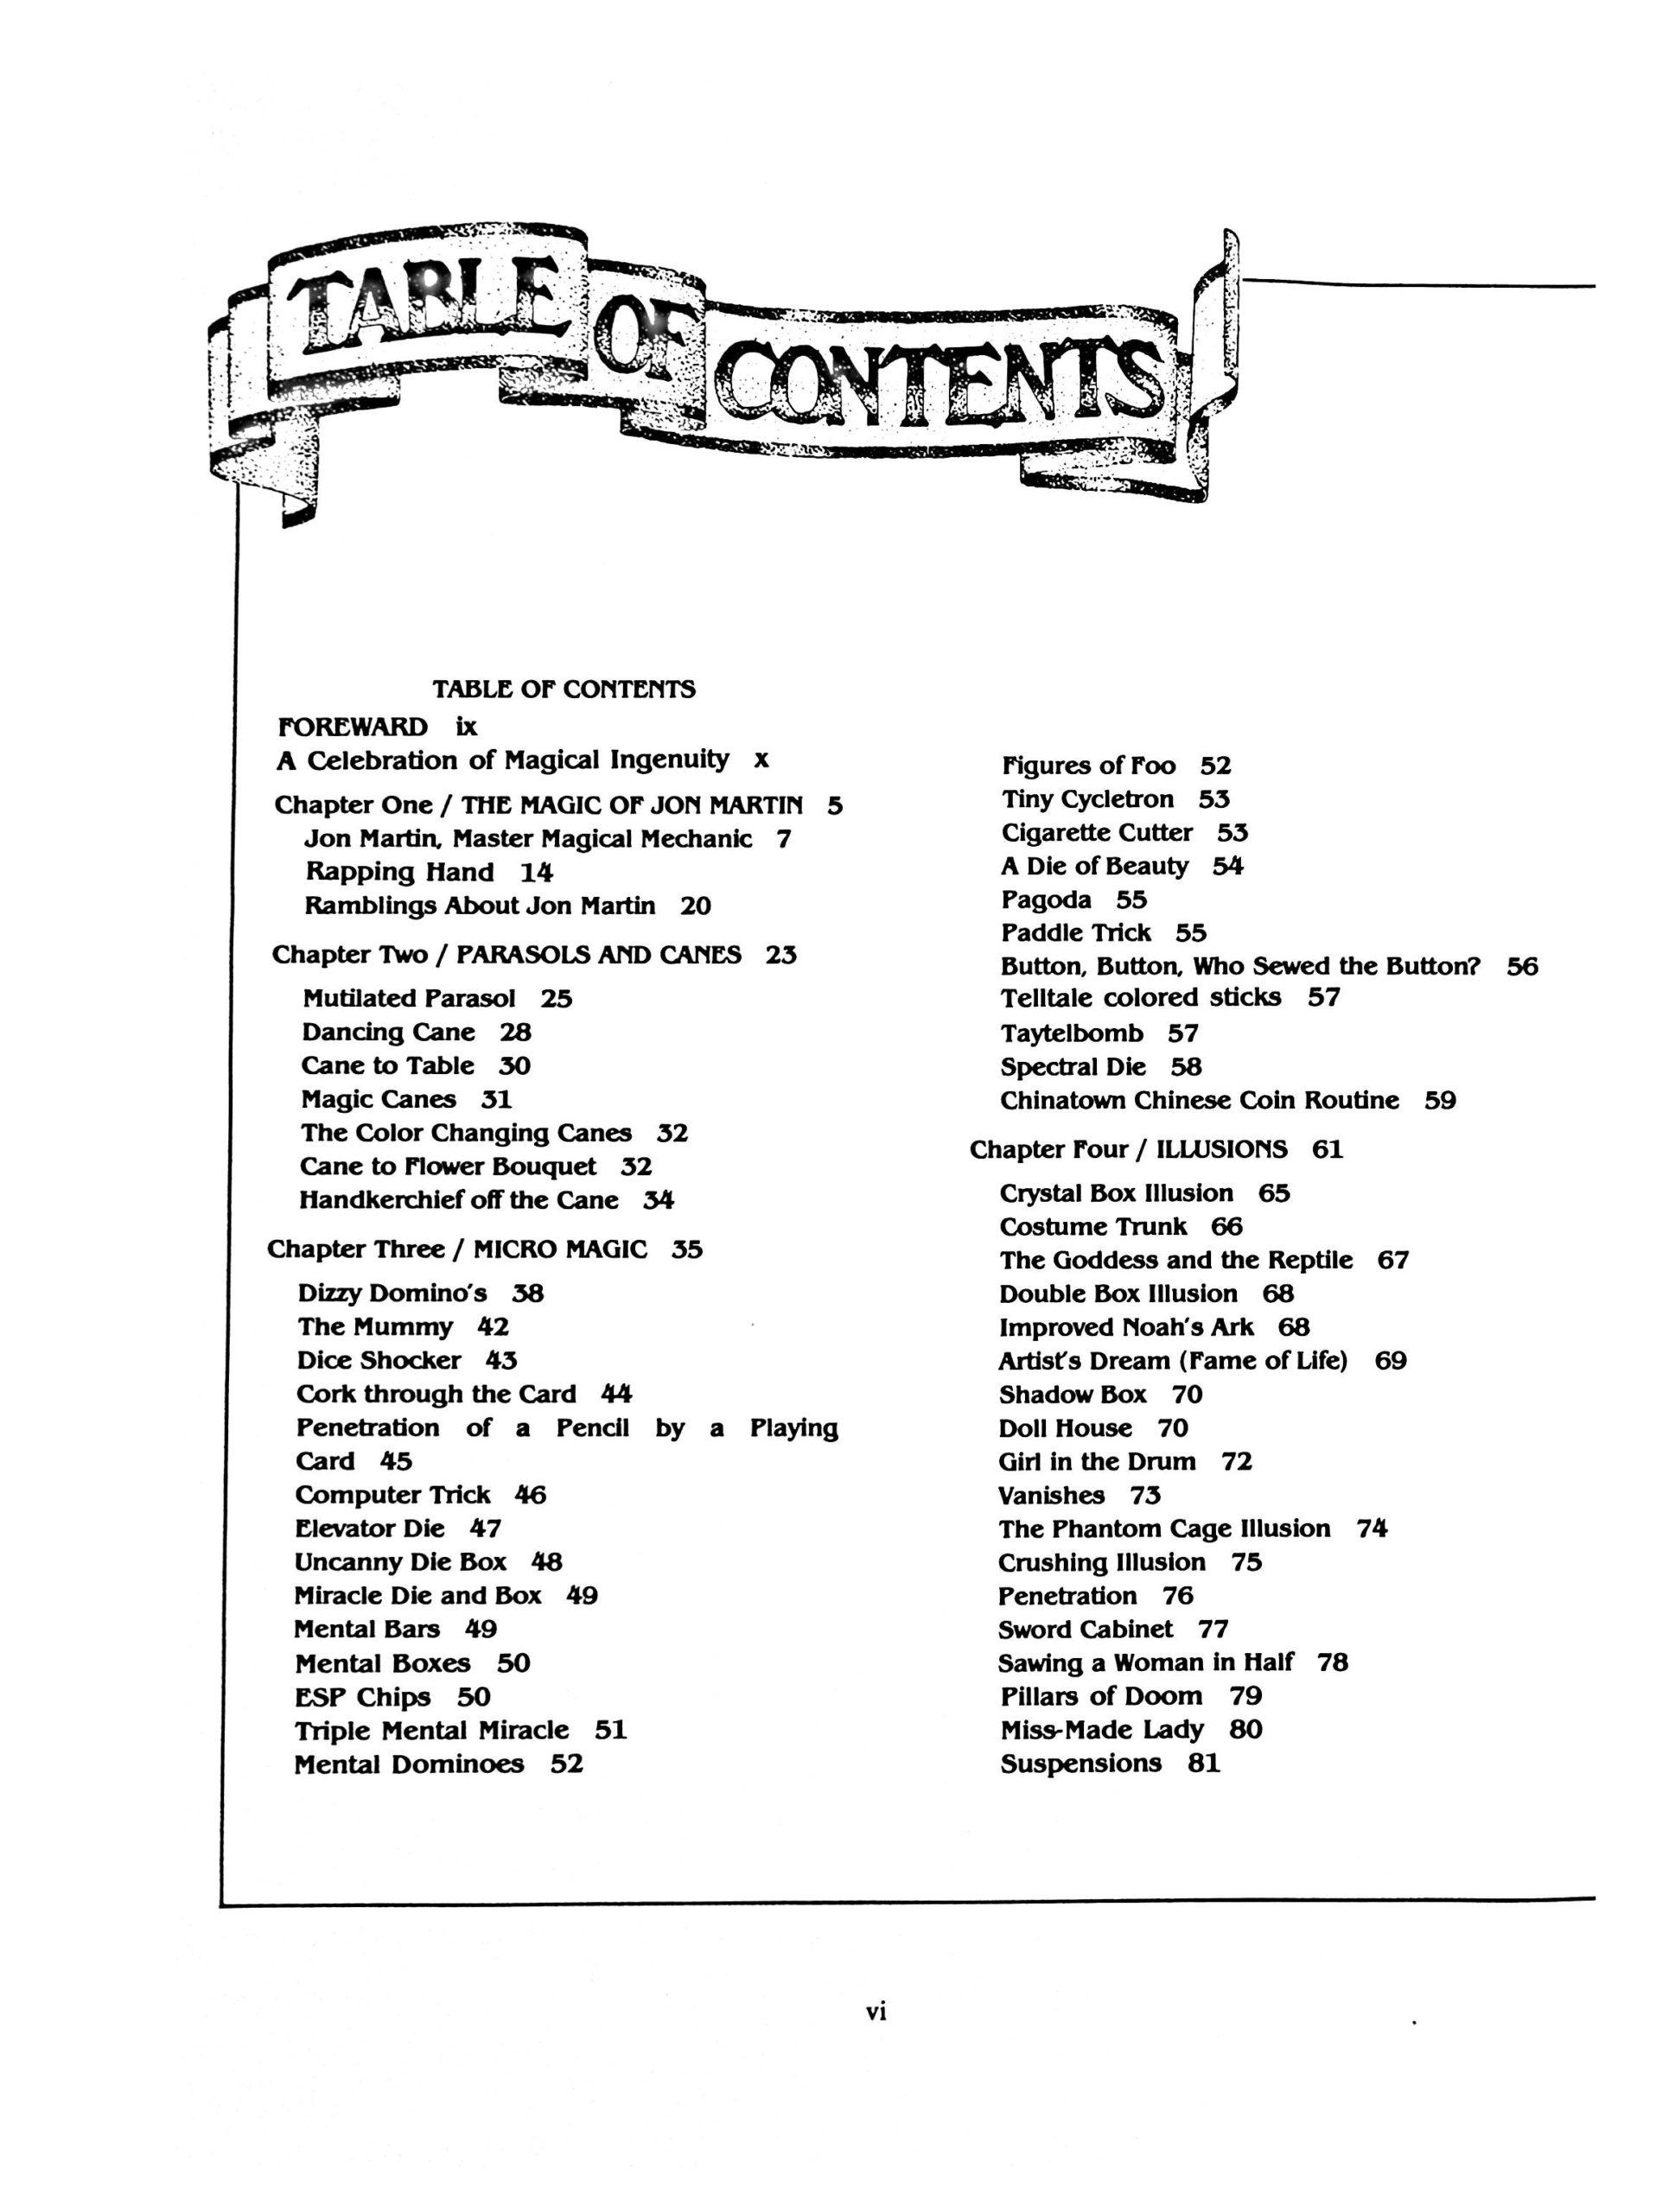 Albo 07 - Classic Magic Index by Robert J. Albo